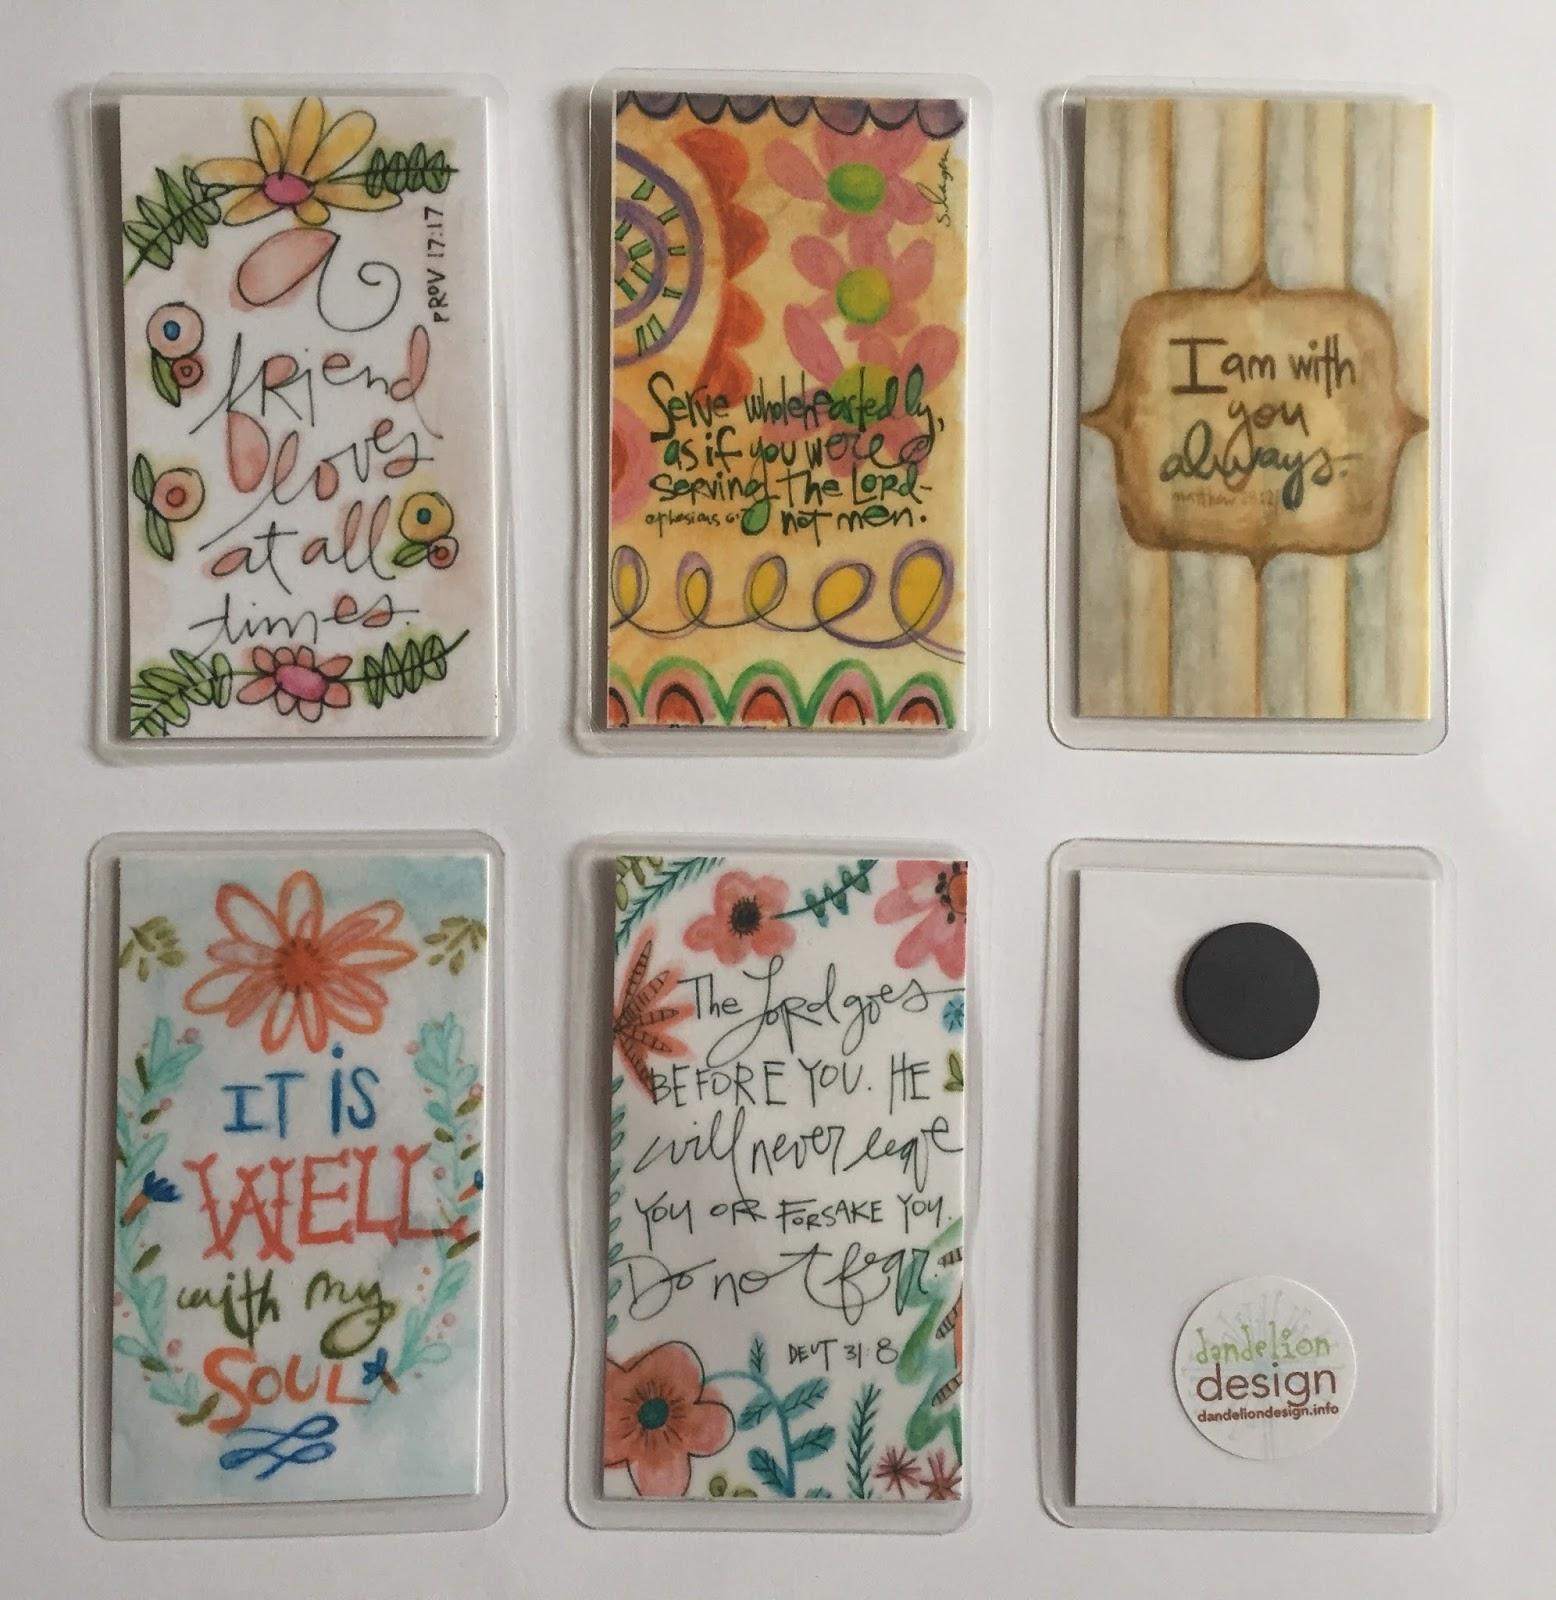 dandelion design small magnets $2 business card size min order